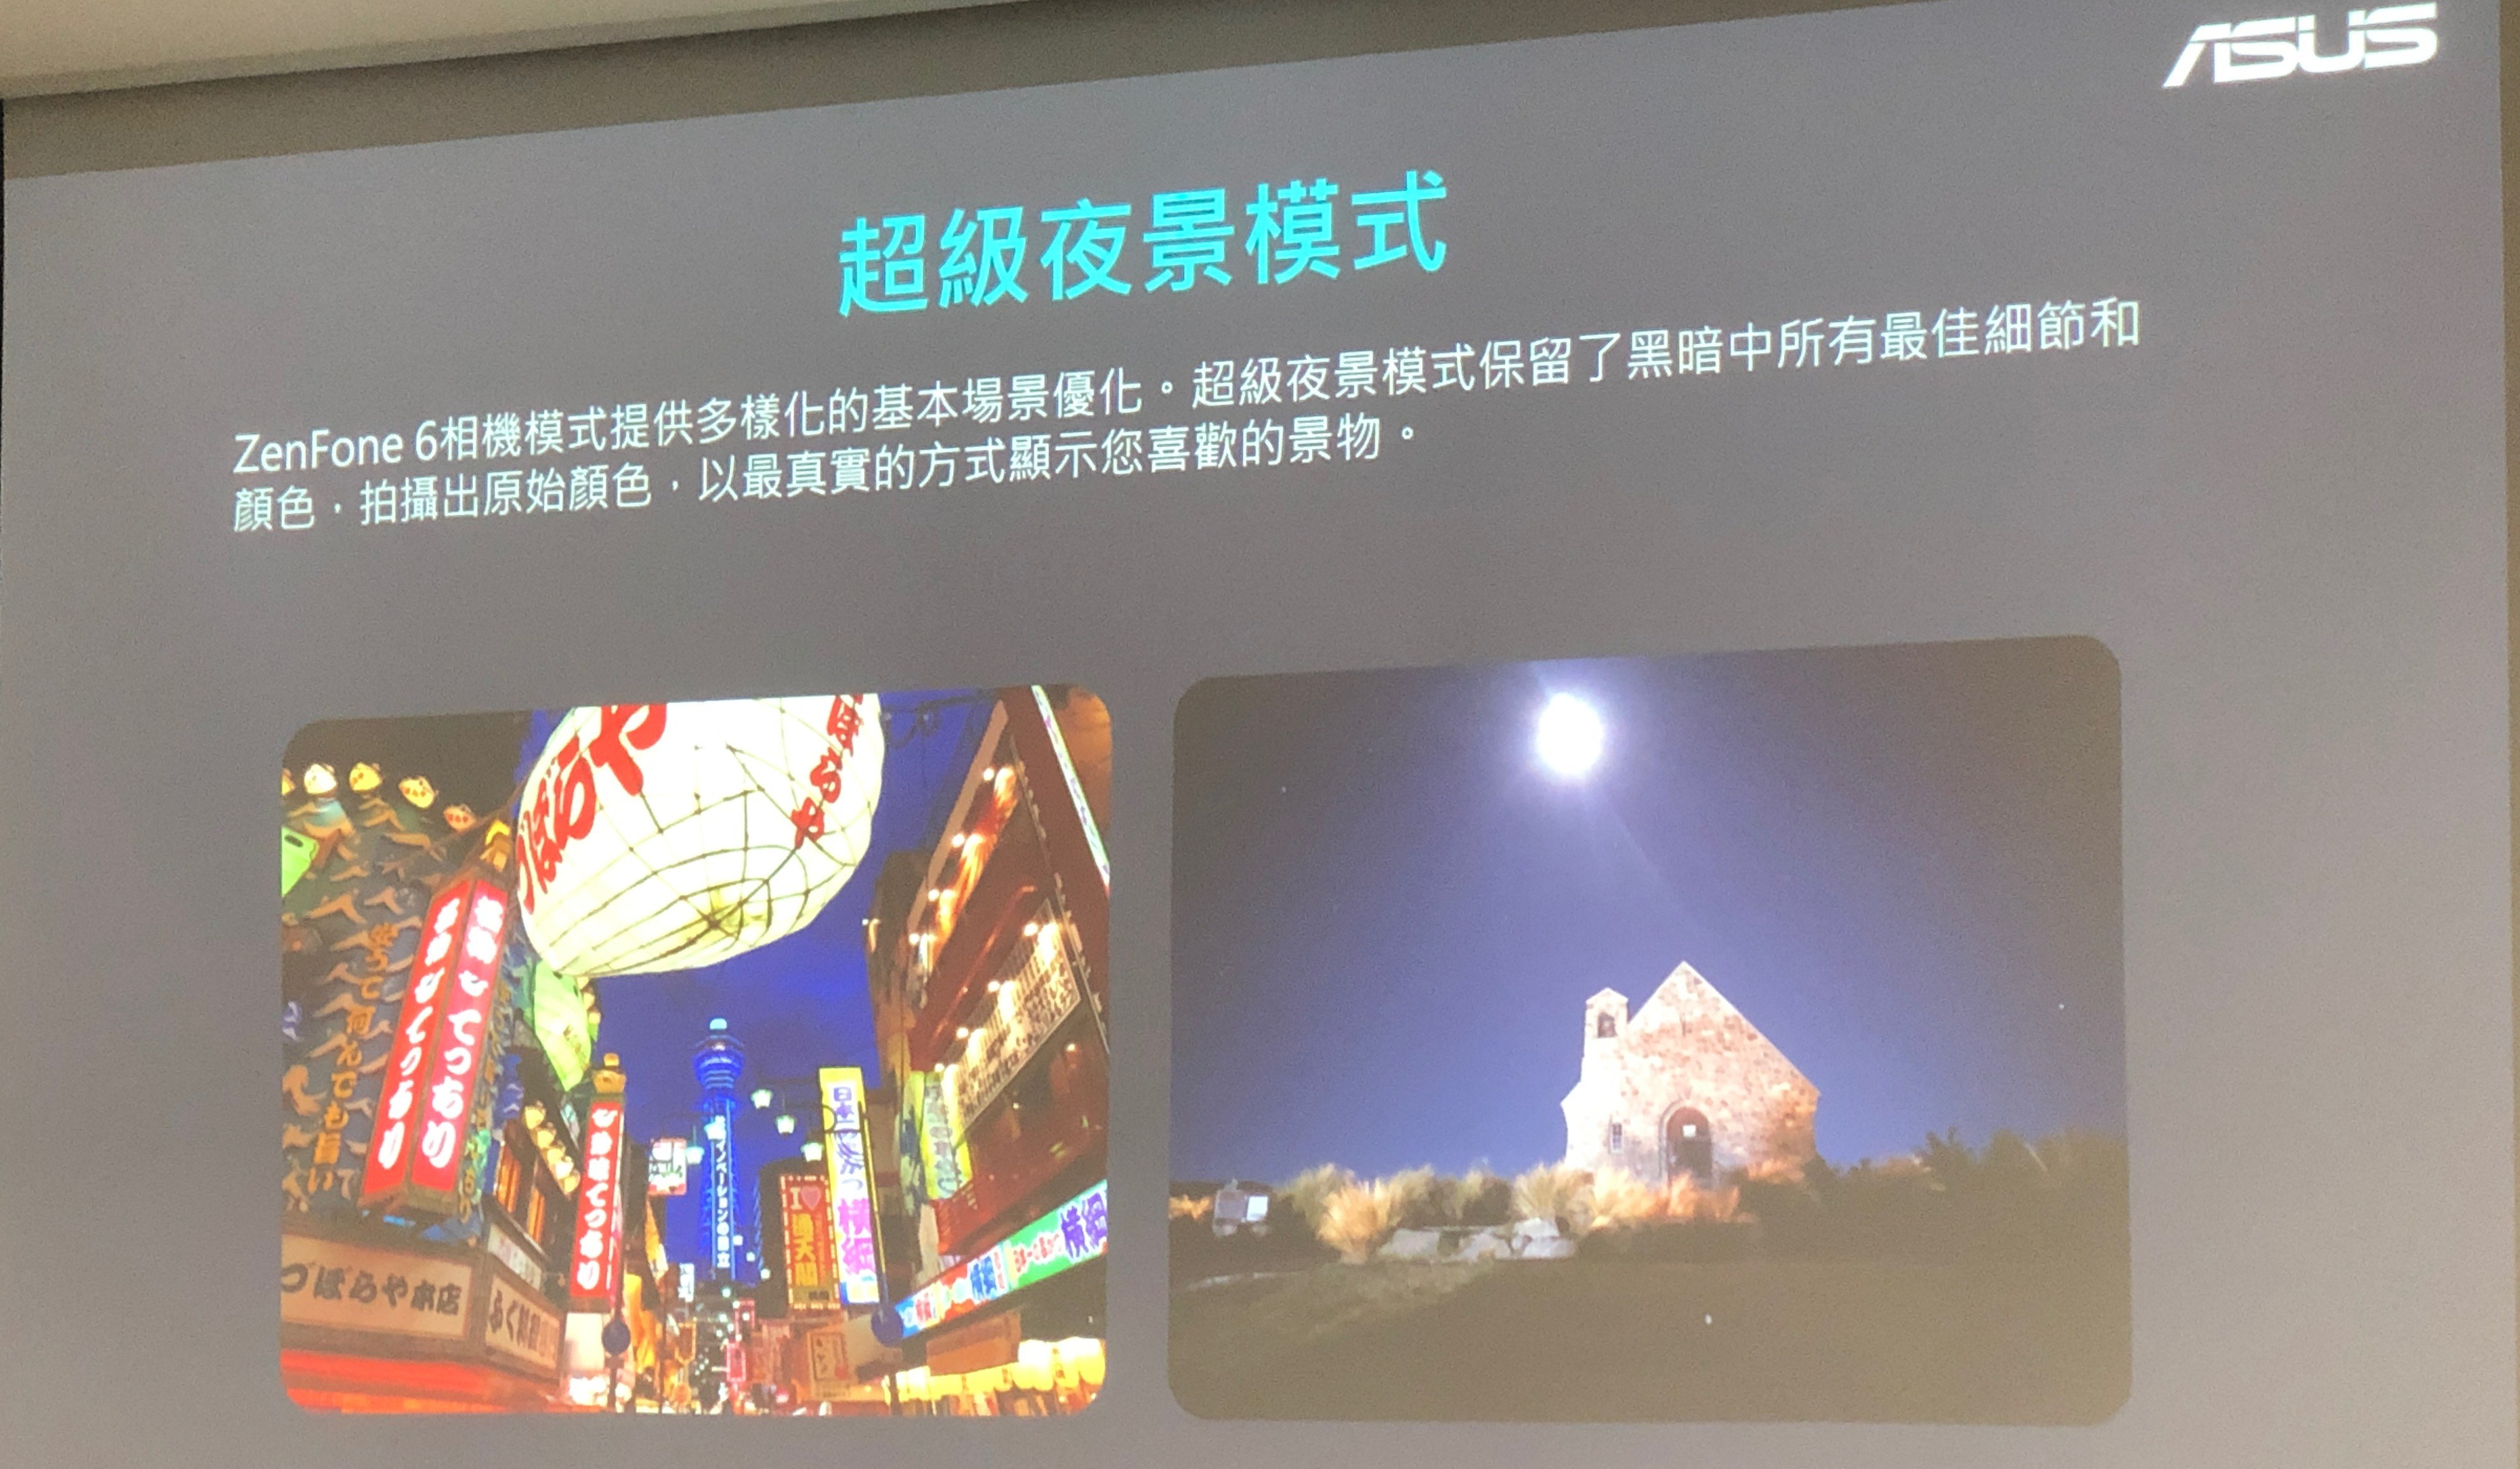 Zenfone 6 超級夜景模式